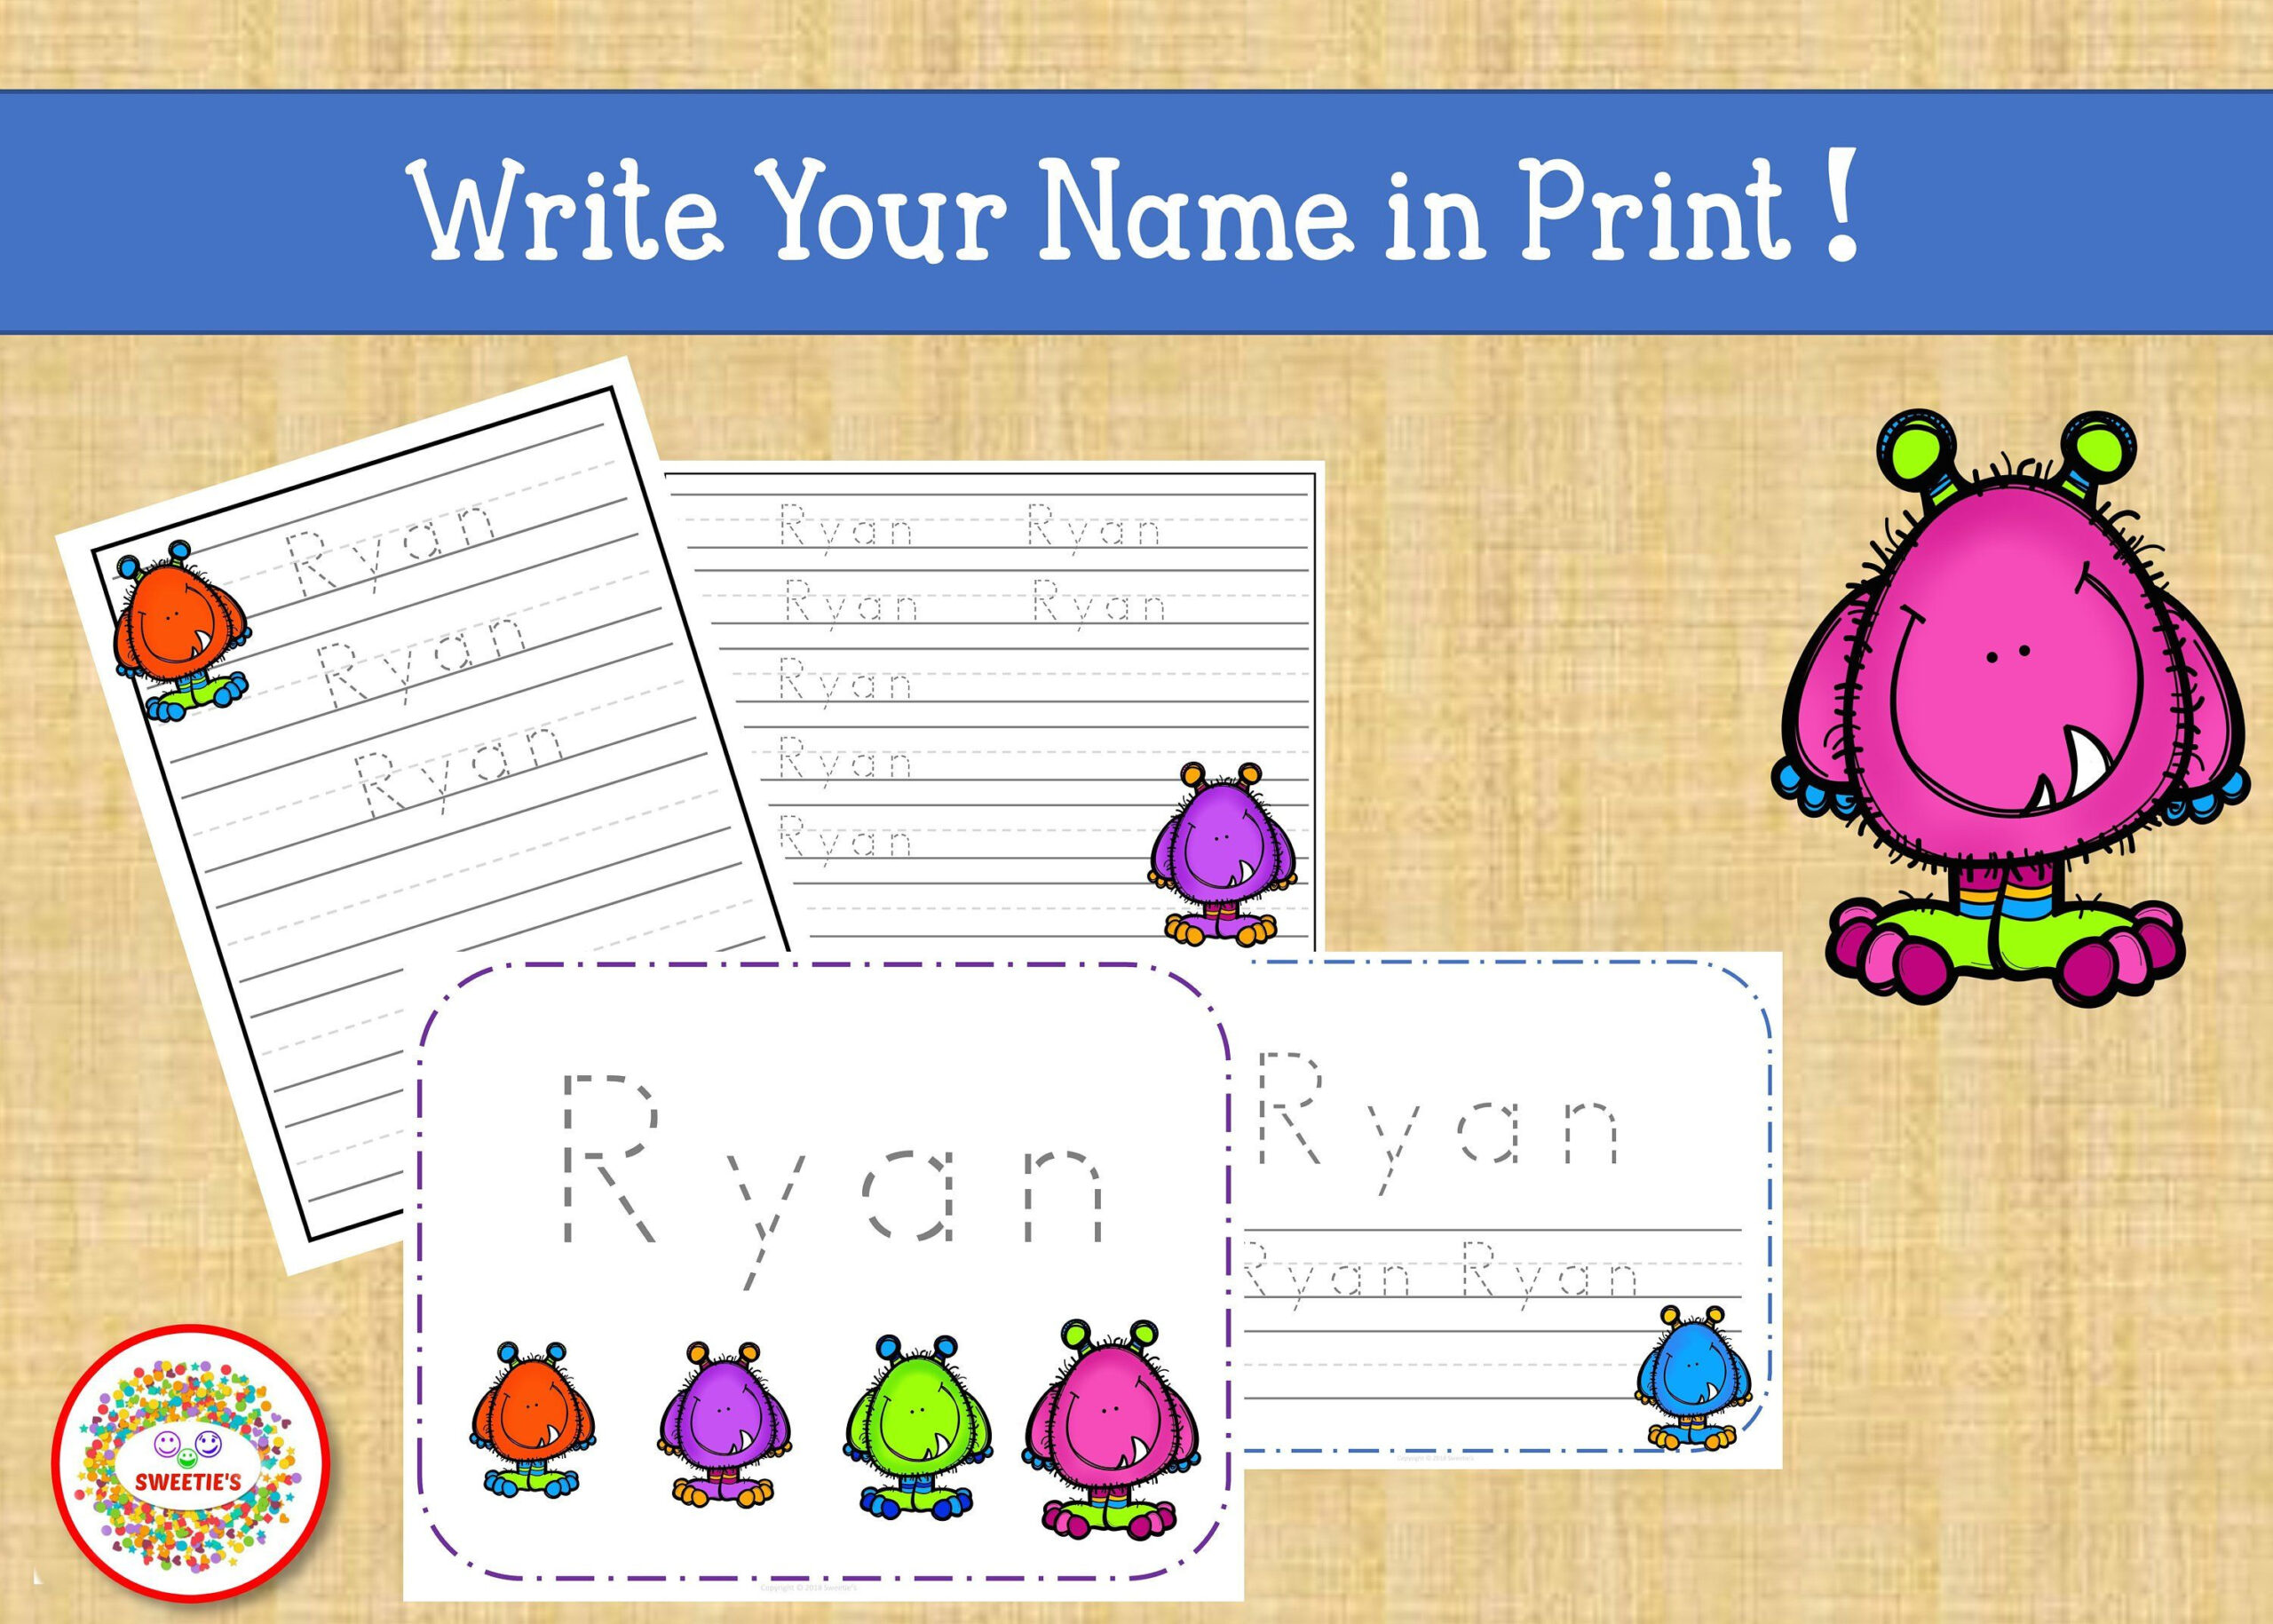 Name Tracing Handwriting Worksheet Personalized Name   Etsy within Name Tracing Personalized